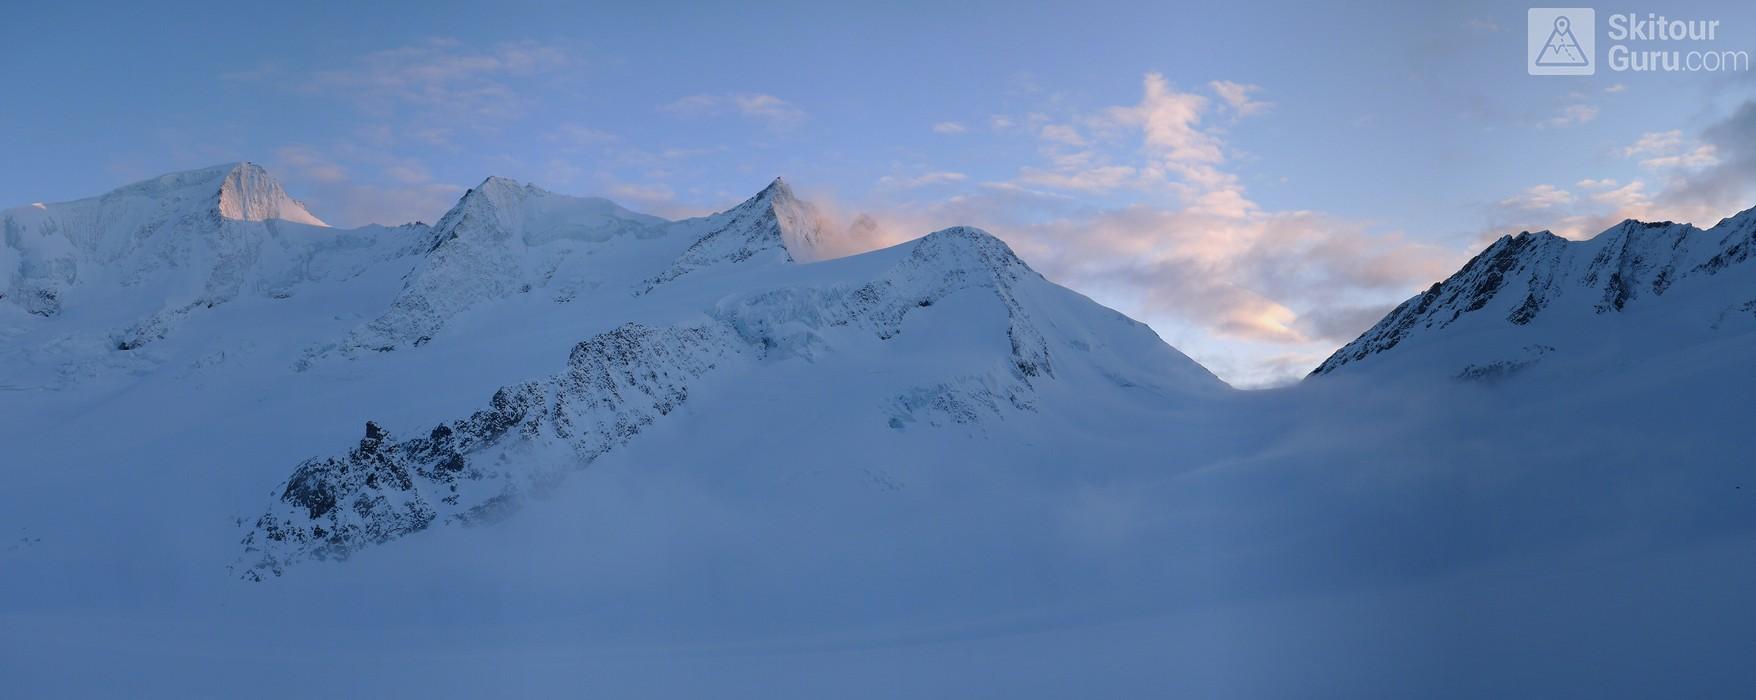 Finsteraarhornhütte Berner Alpen / Alpes bernoises Schweiz panorama 22